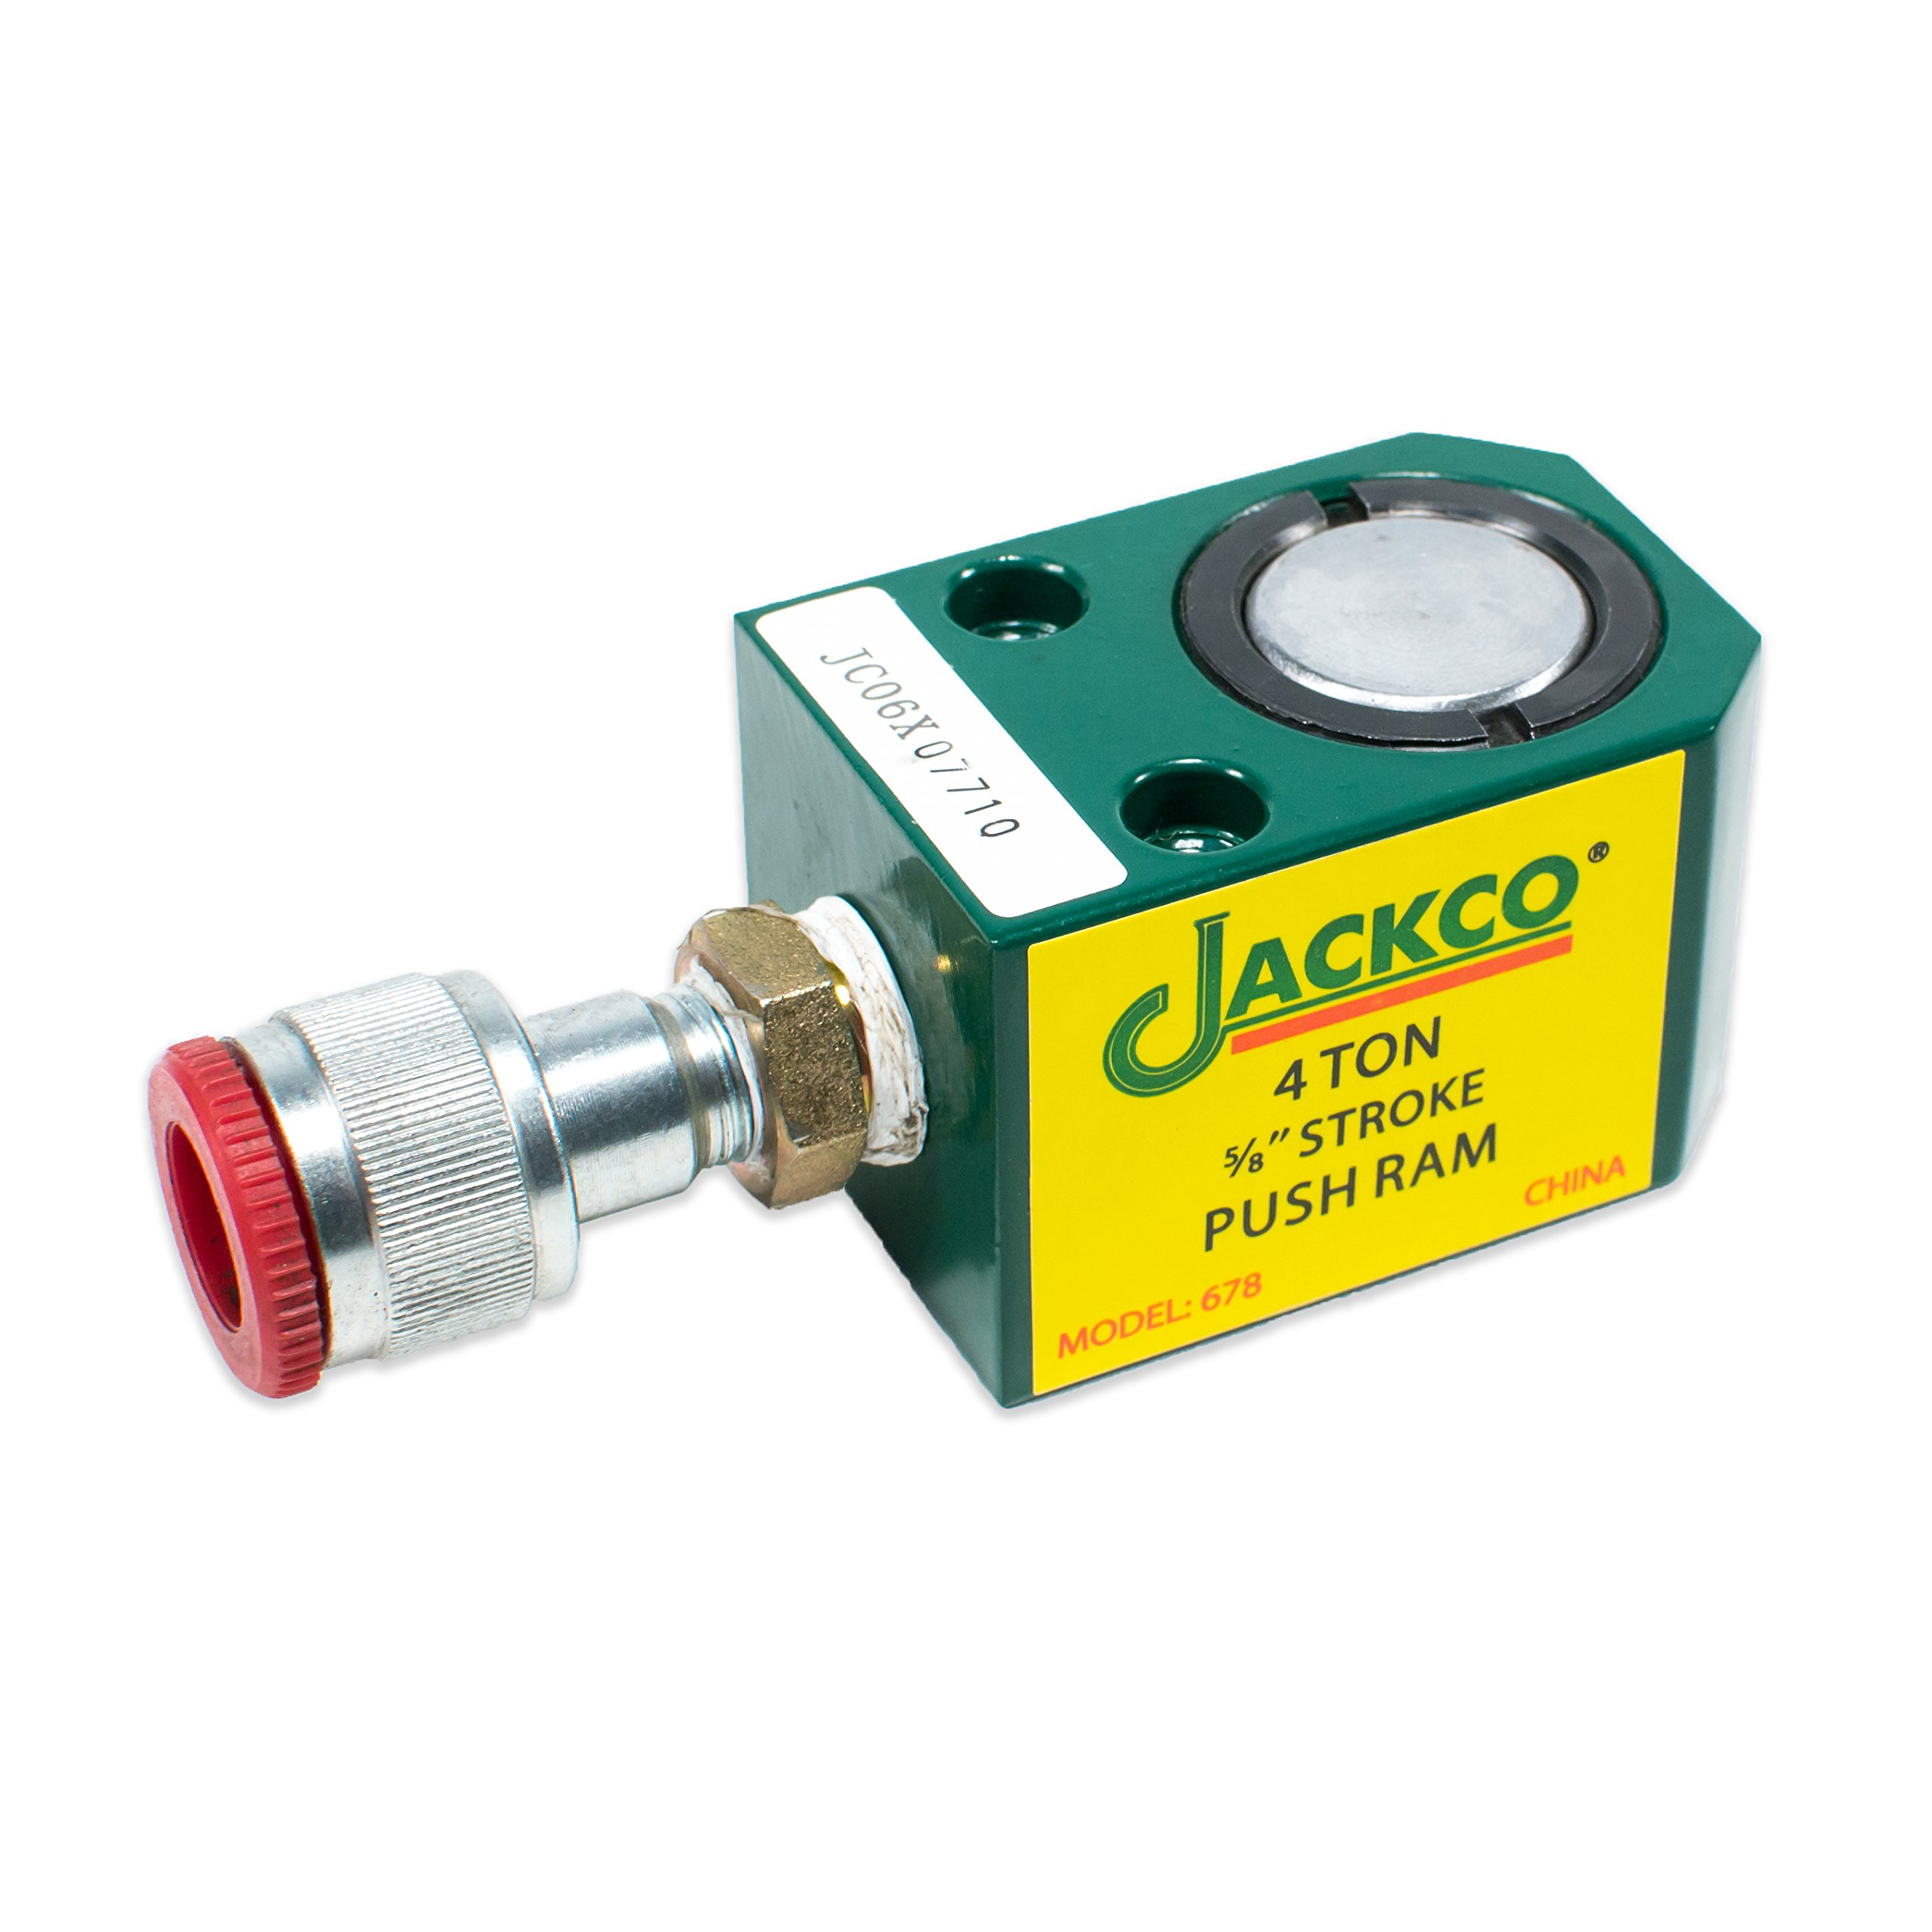 Jackco 4 Ton Mini 5/8'' Stroke Hydraulic Ram